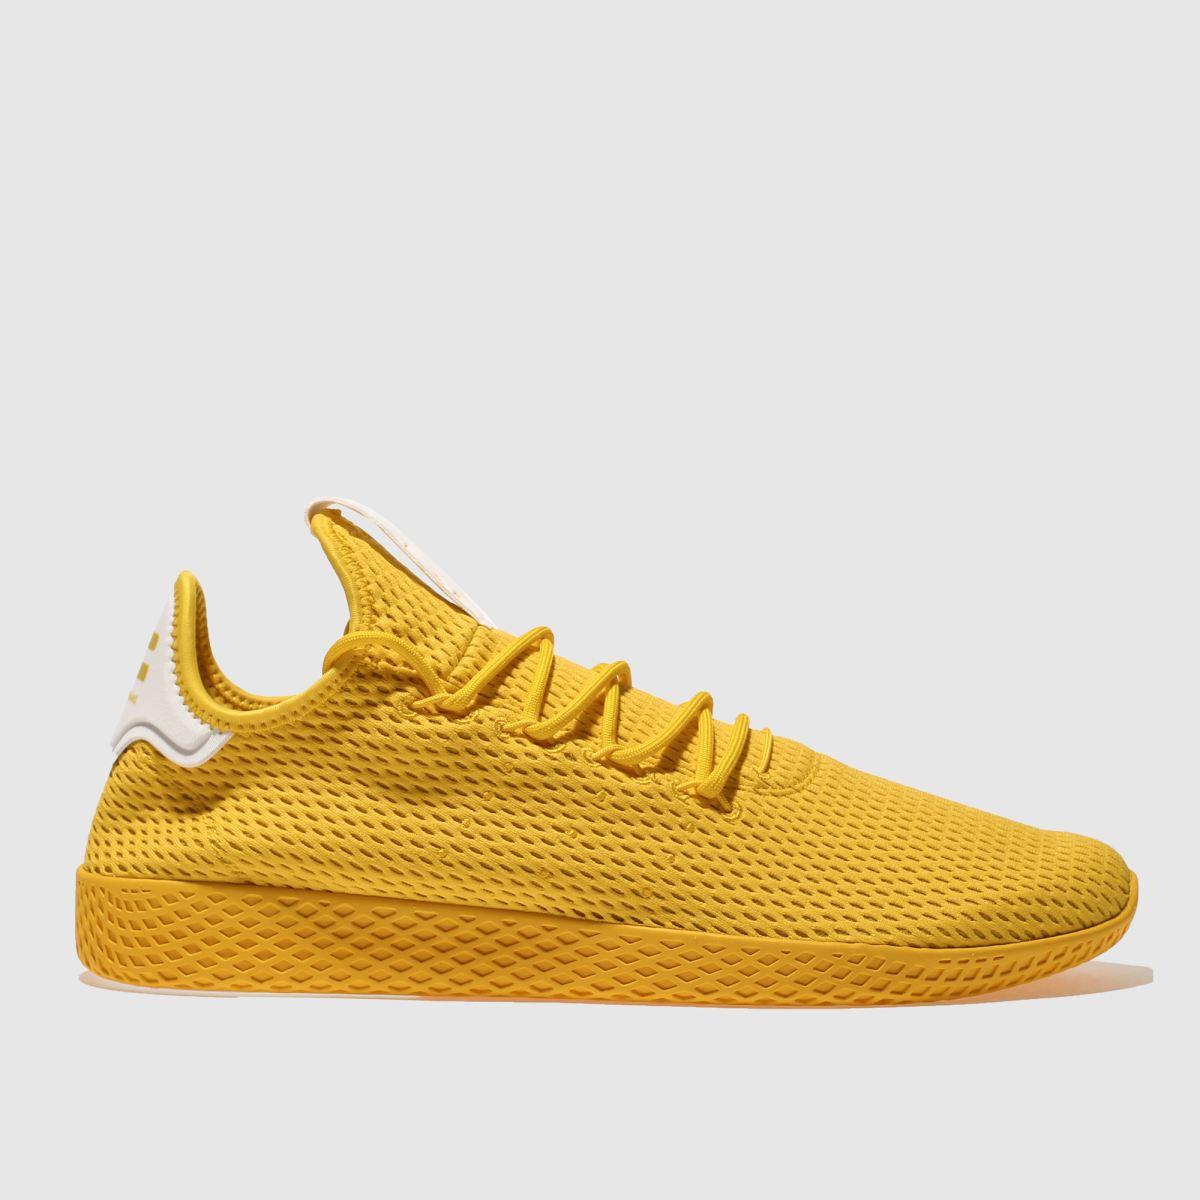 adidas yellow pharrell williams tennis hu trainers